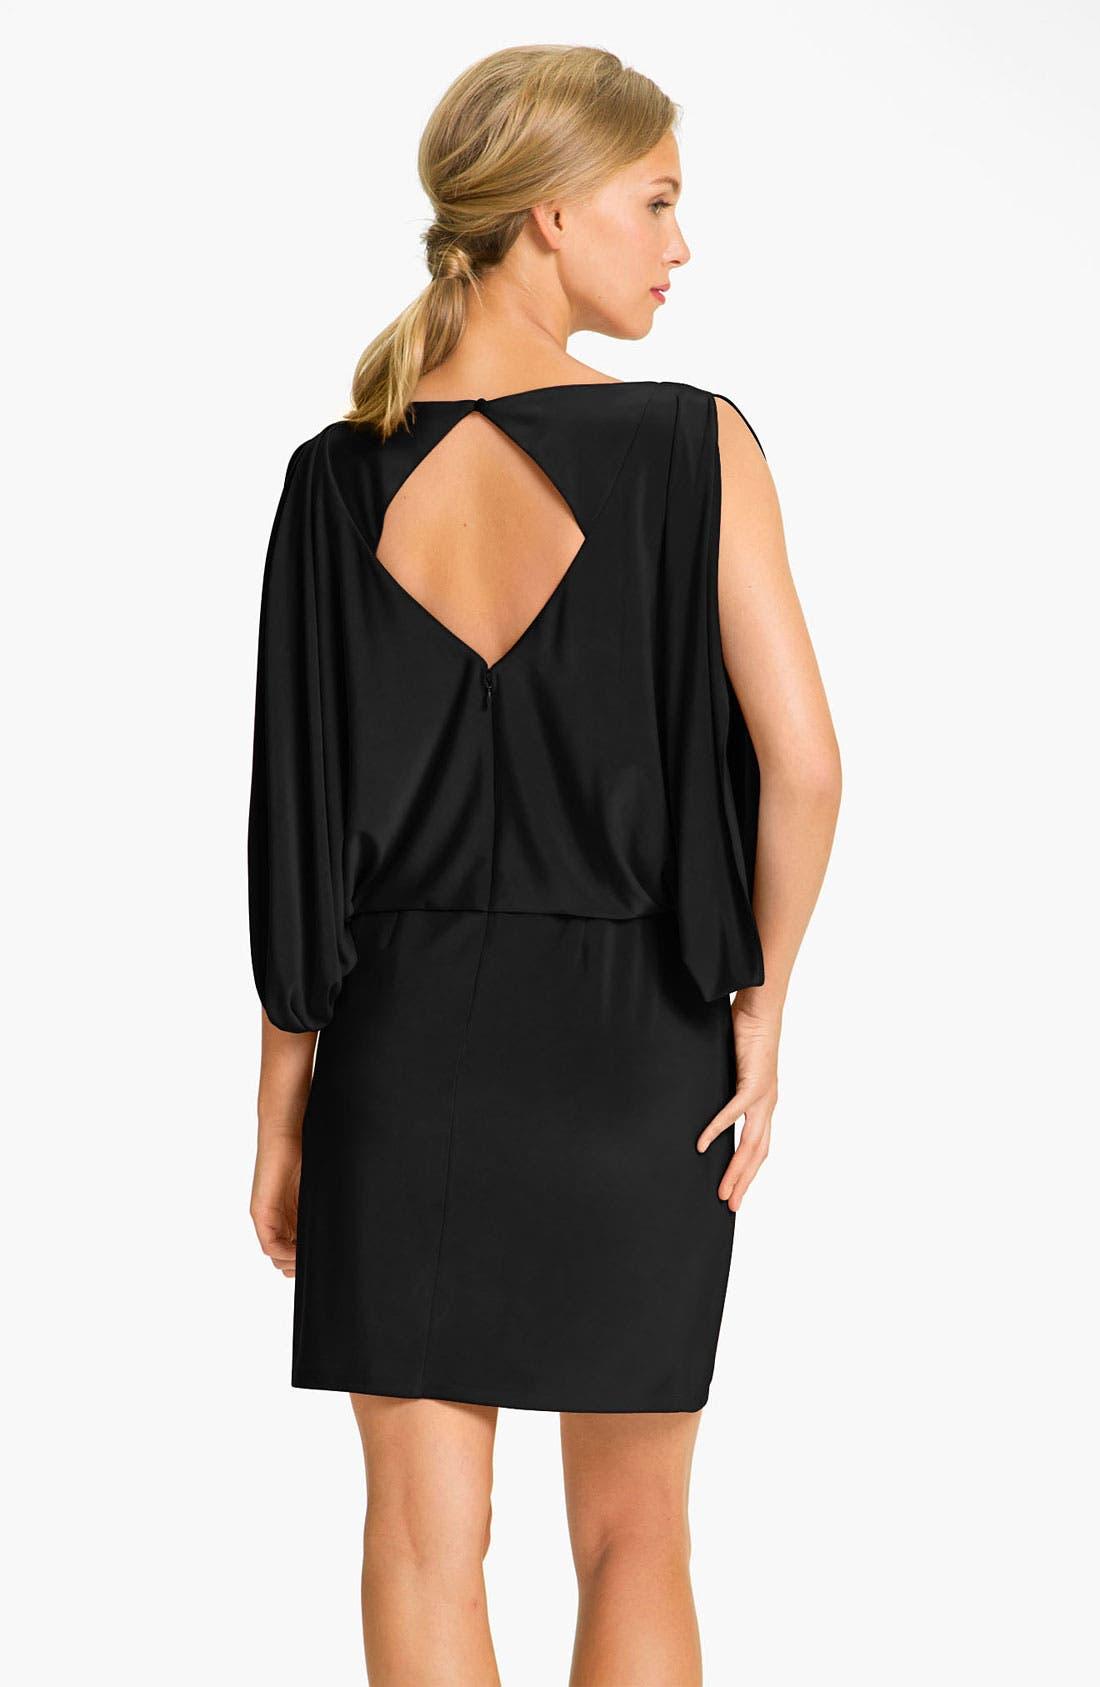 JESSICA SIMPSON,                             Draped Sleeve Jersey Blouson Dress,                             Alternate thumbnail 2, color,                             001